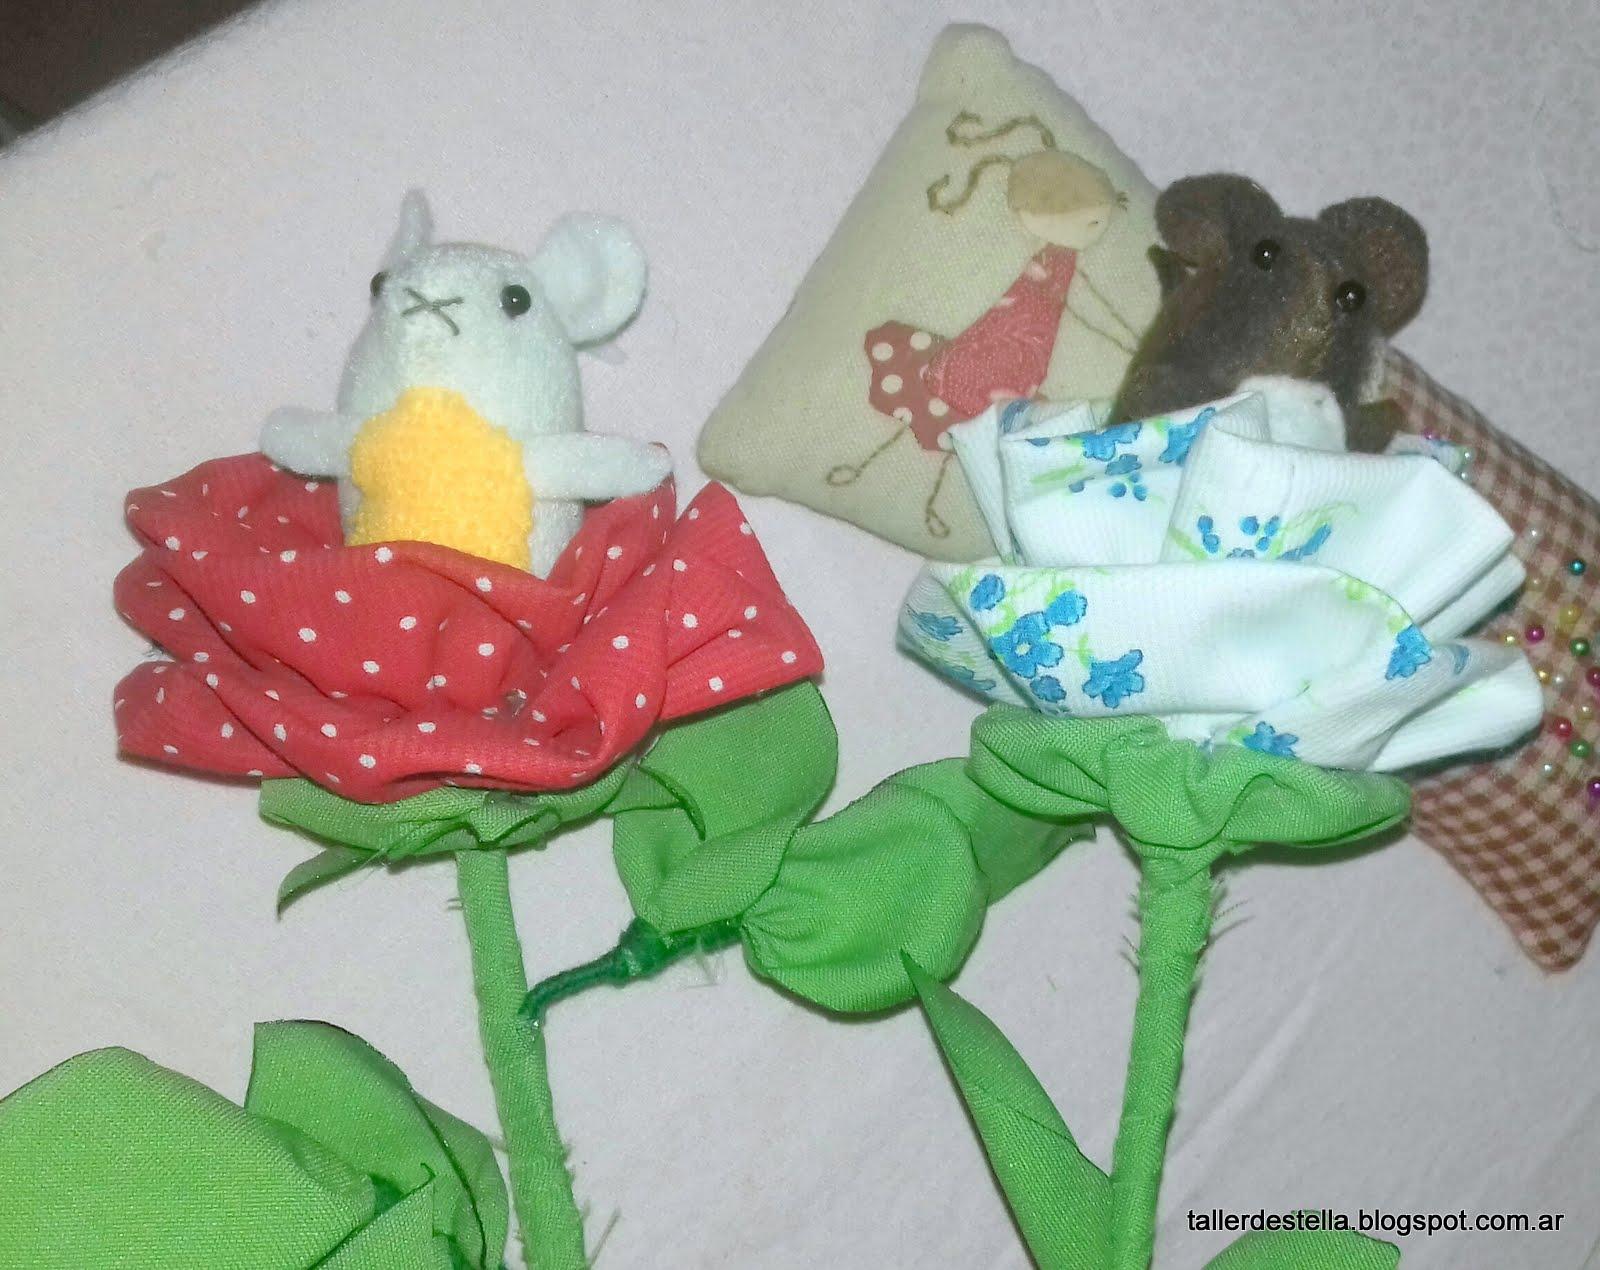 Ratoncitos en Flor